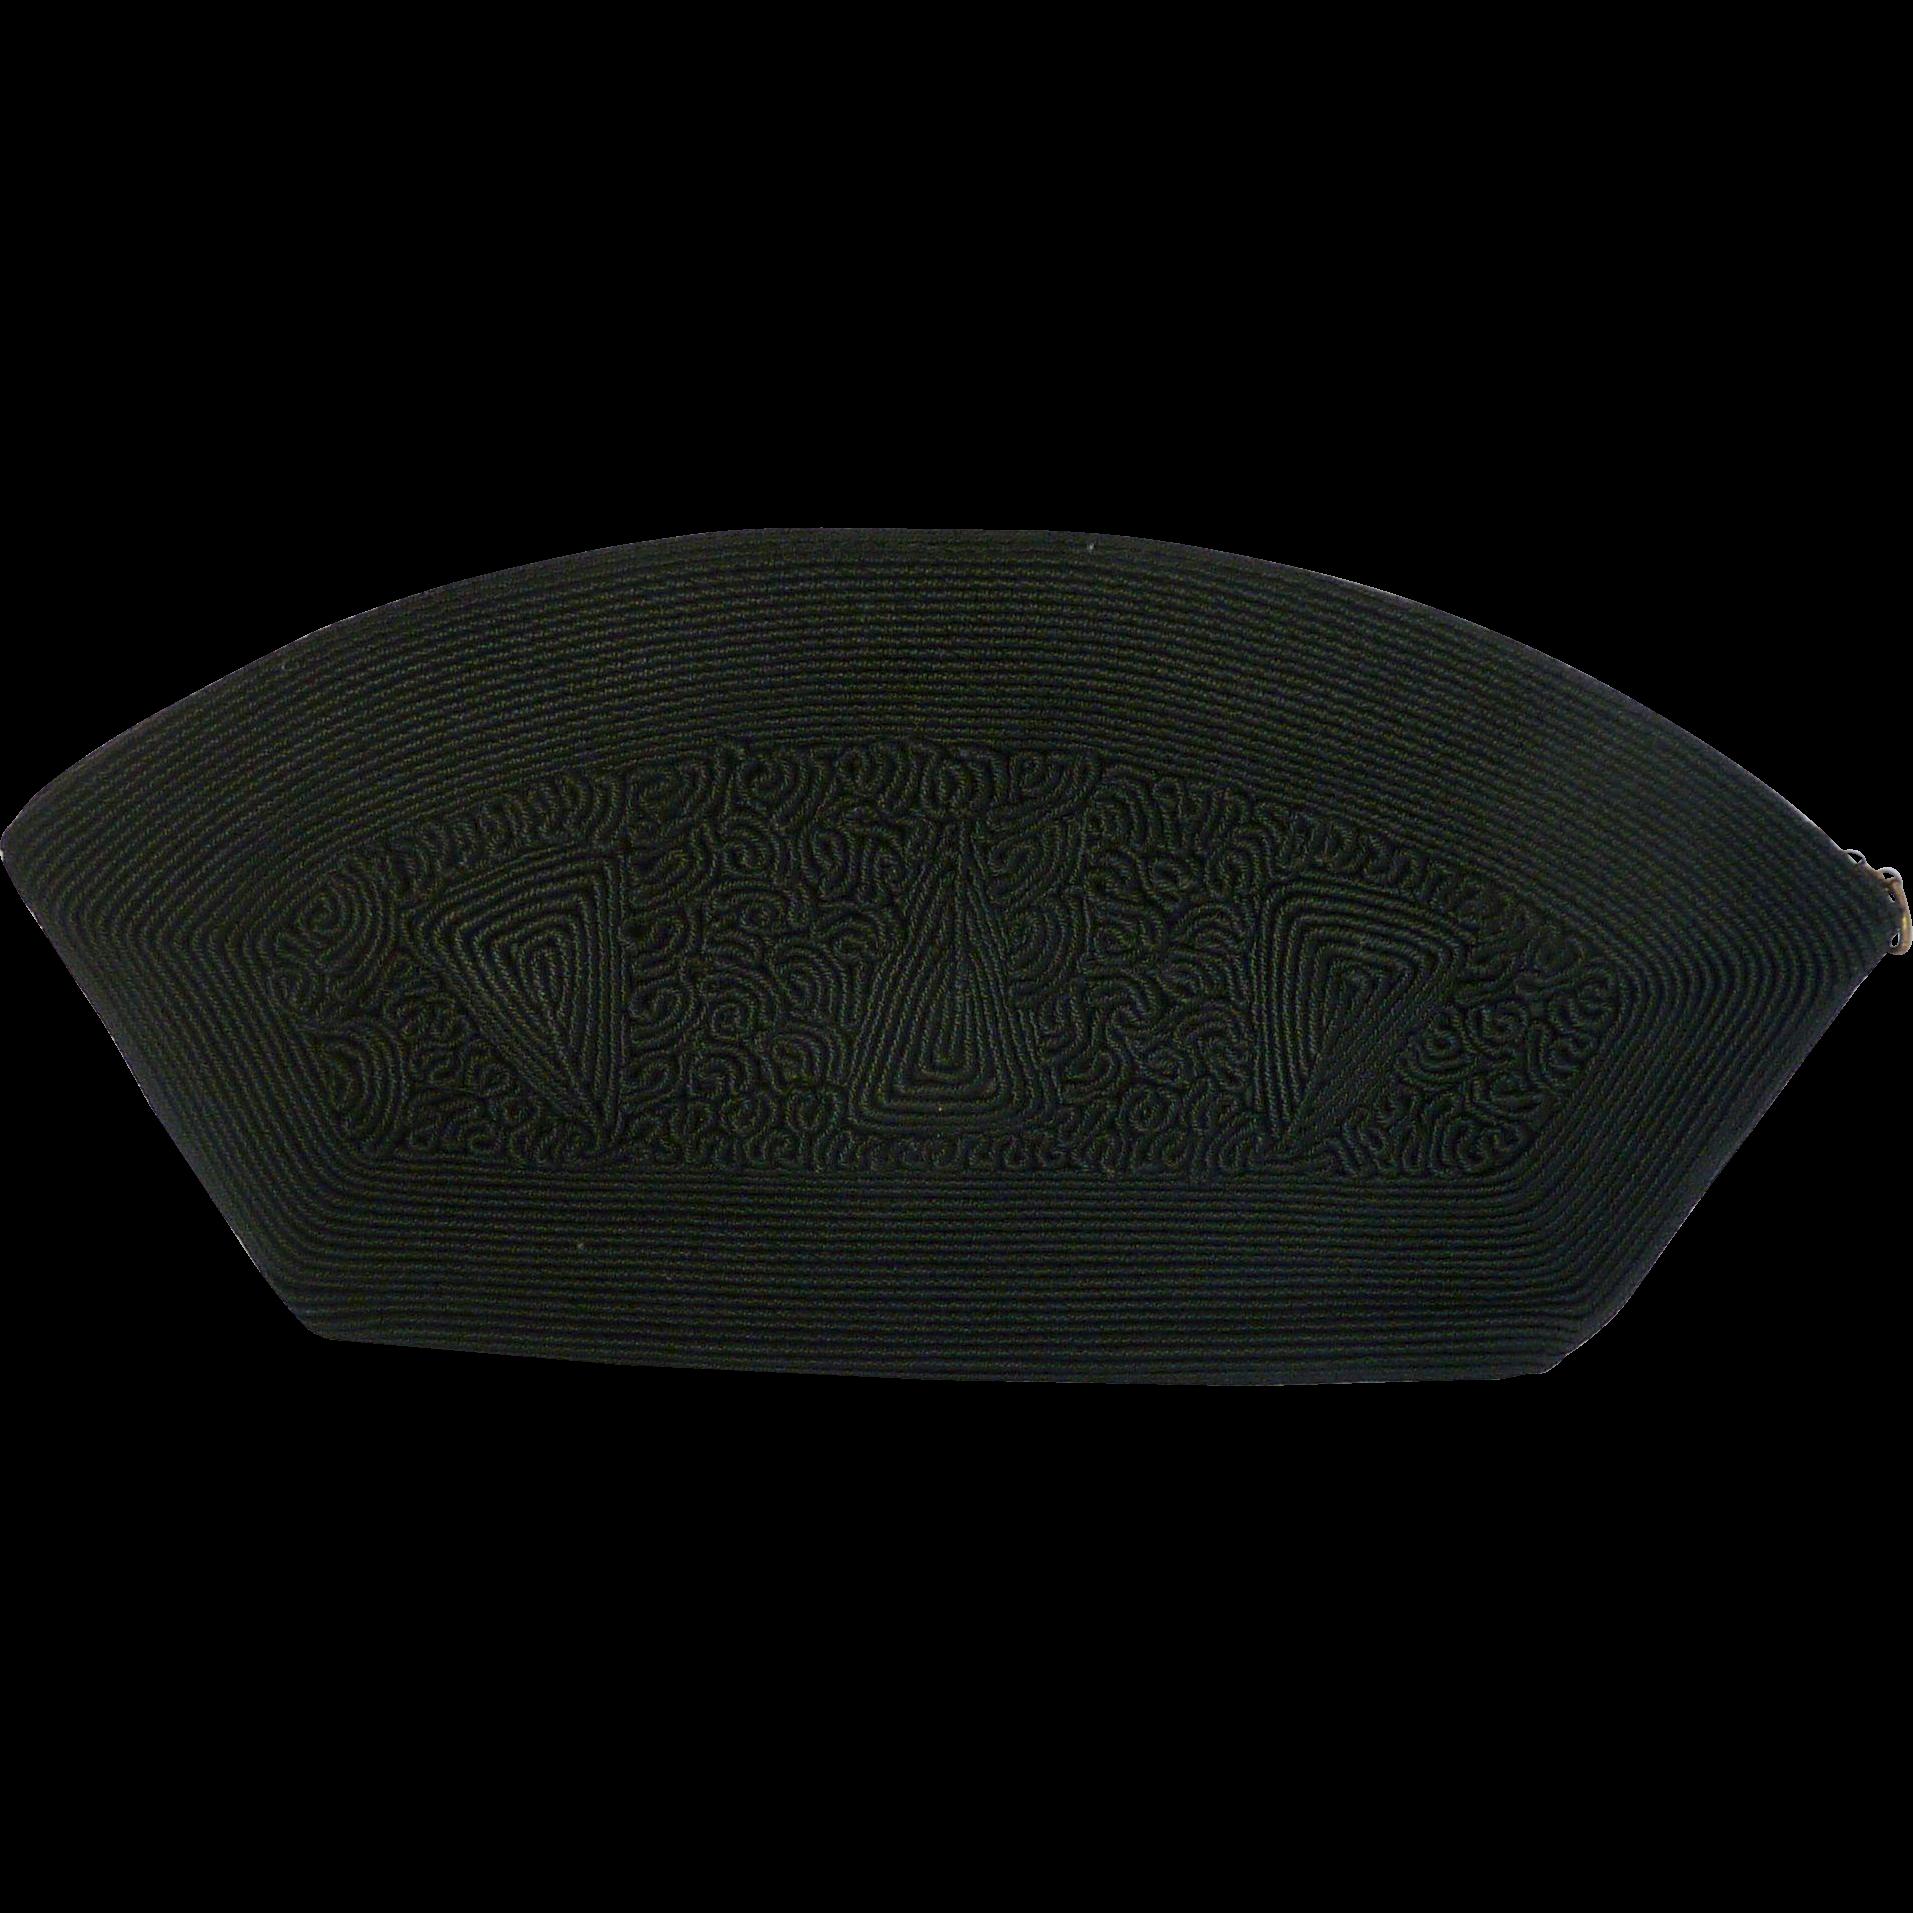 Black 1940's Corde Clutch Handbag